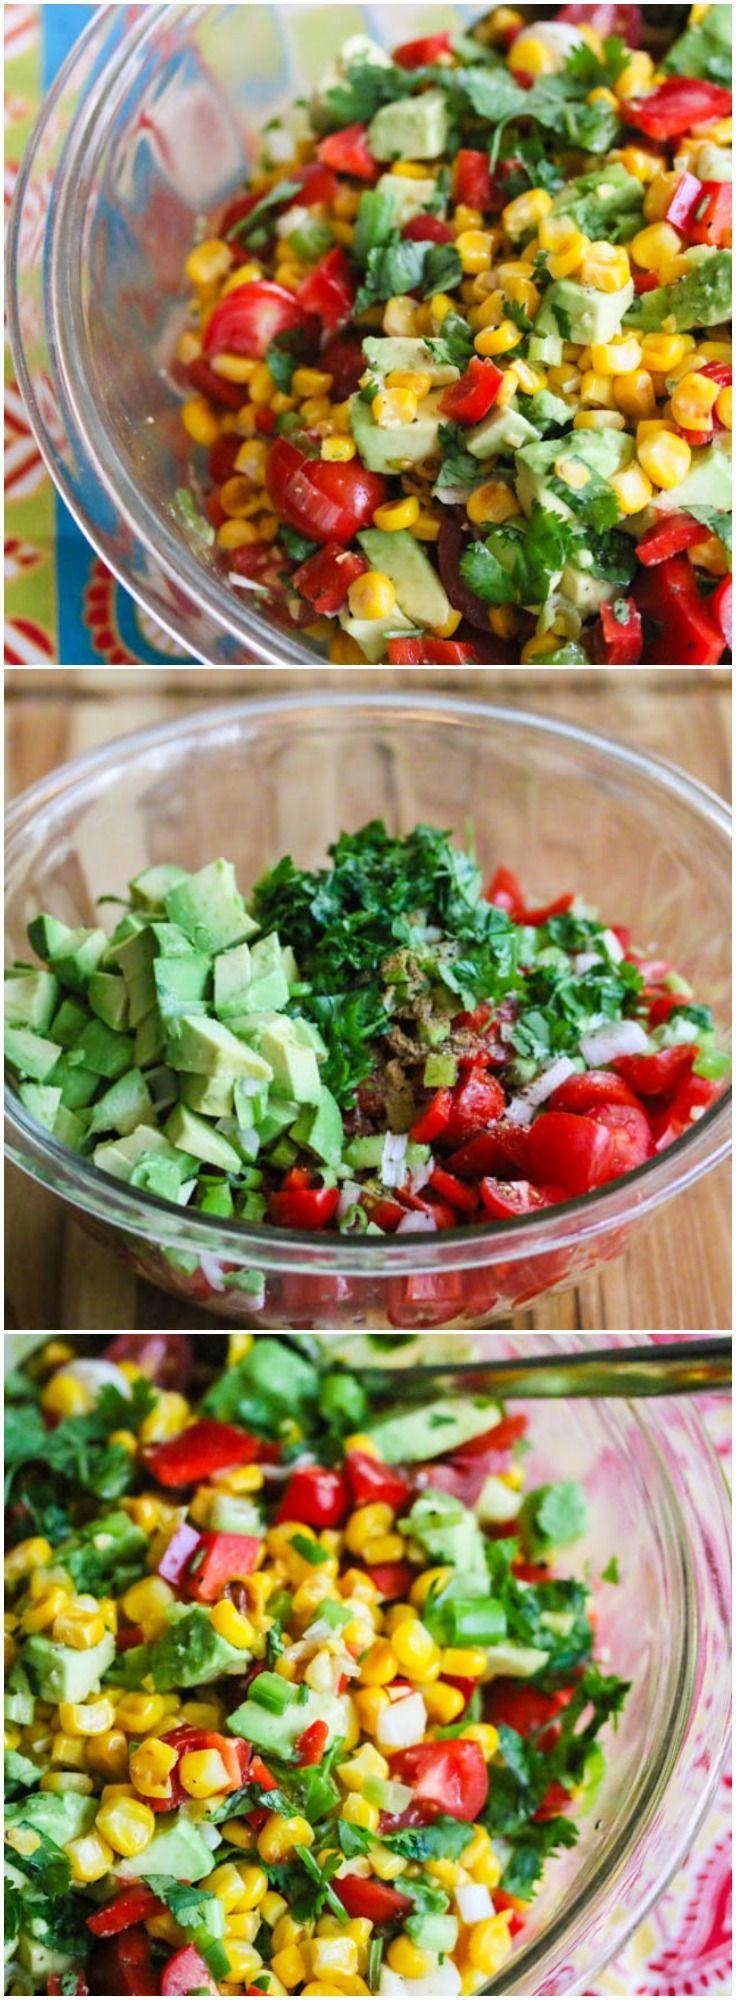 Corn Avocado Tomato Salad. by jeanetteshealthyliving #Salad #Corn #Avocado #Tomato #Healthy